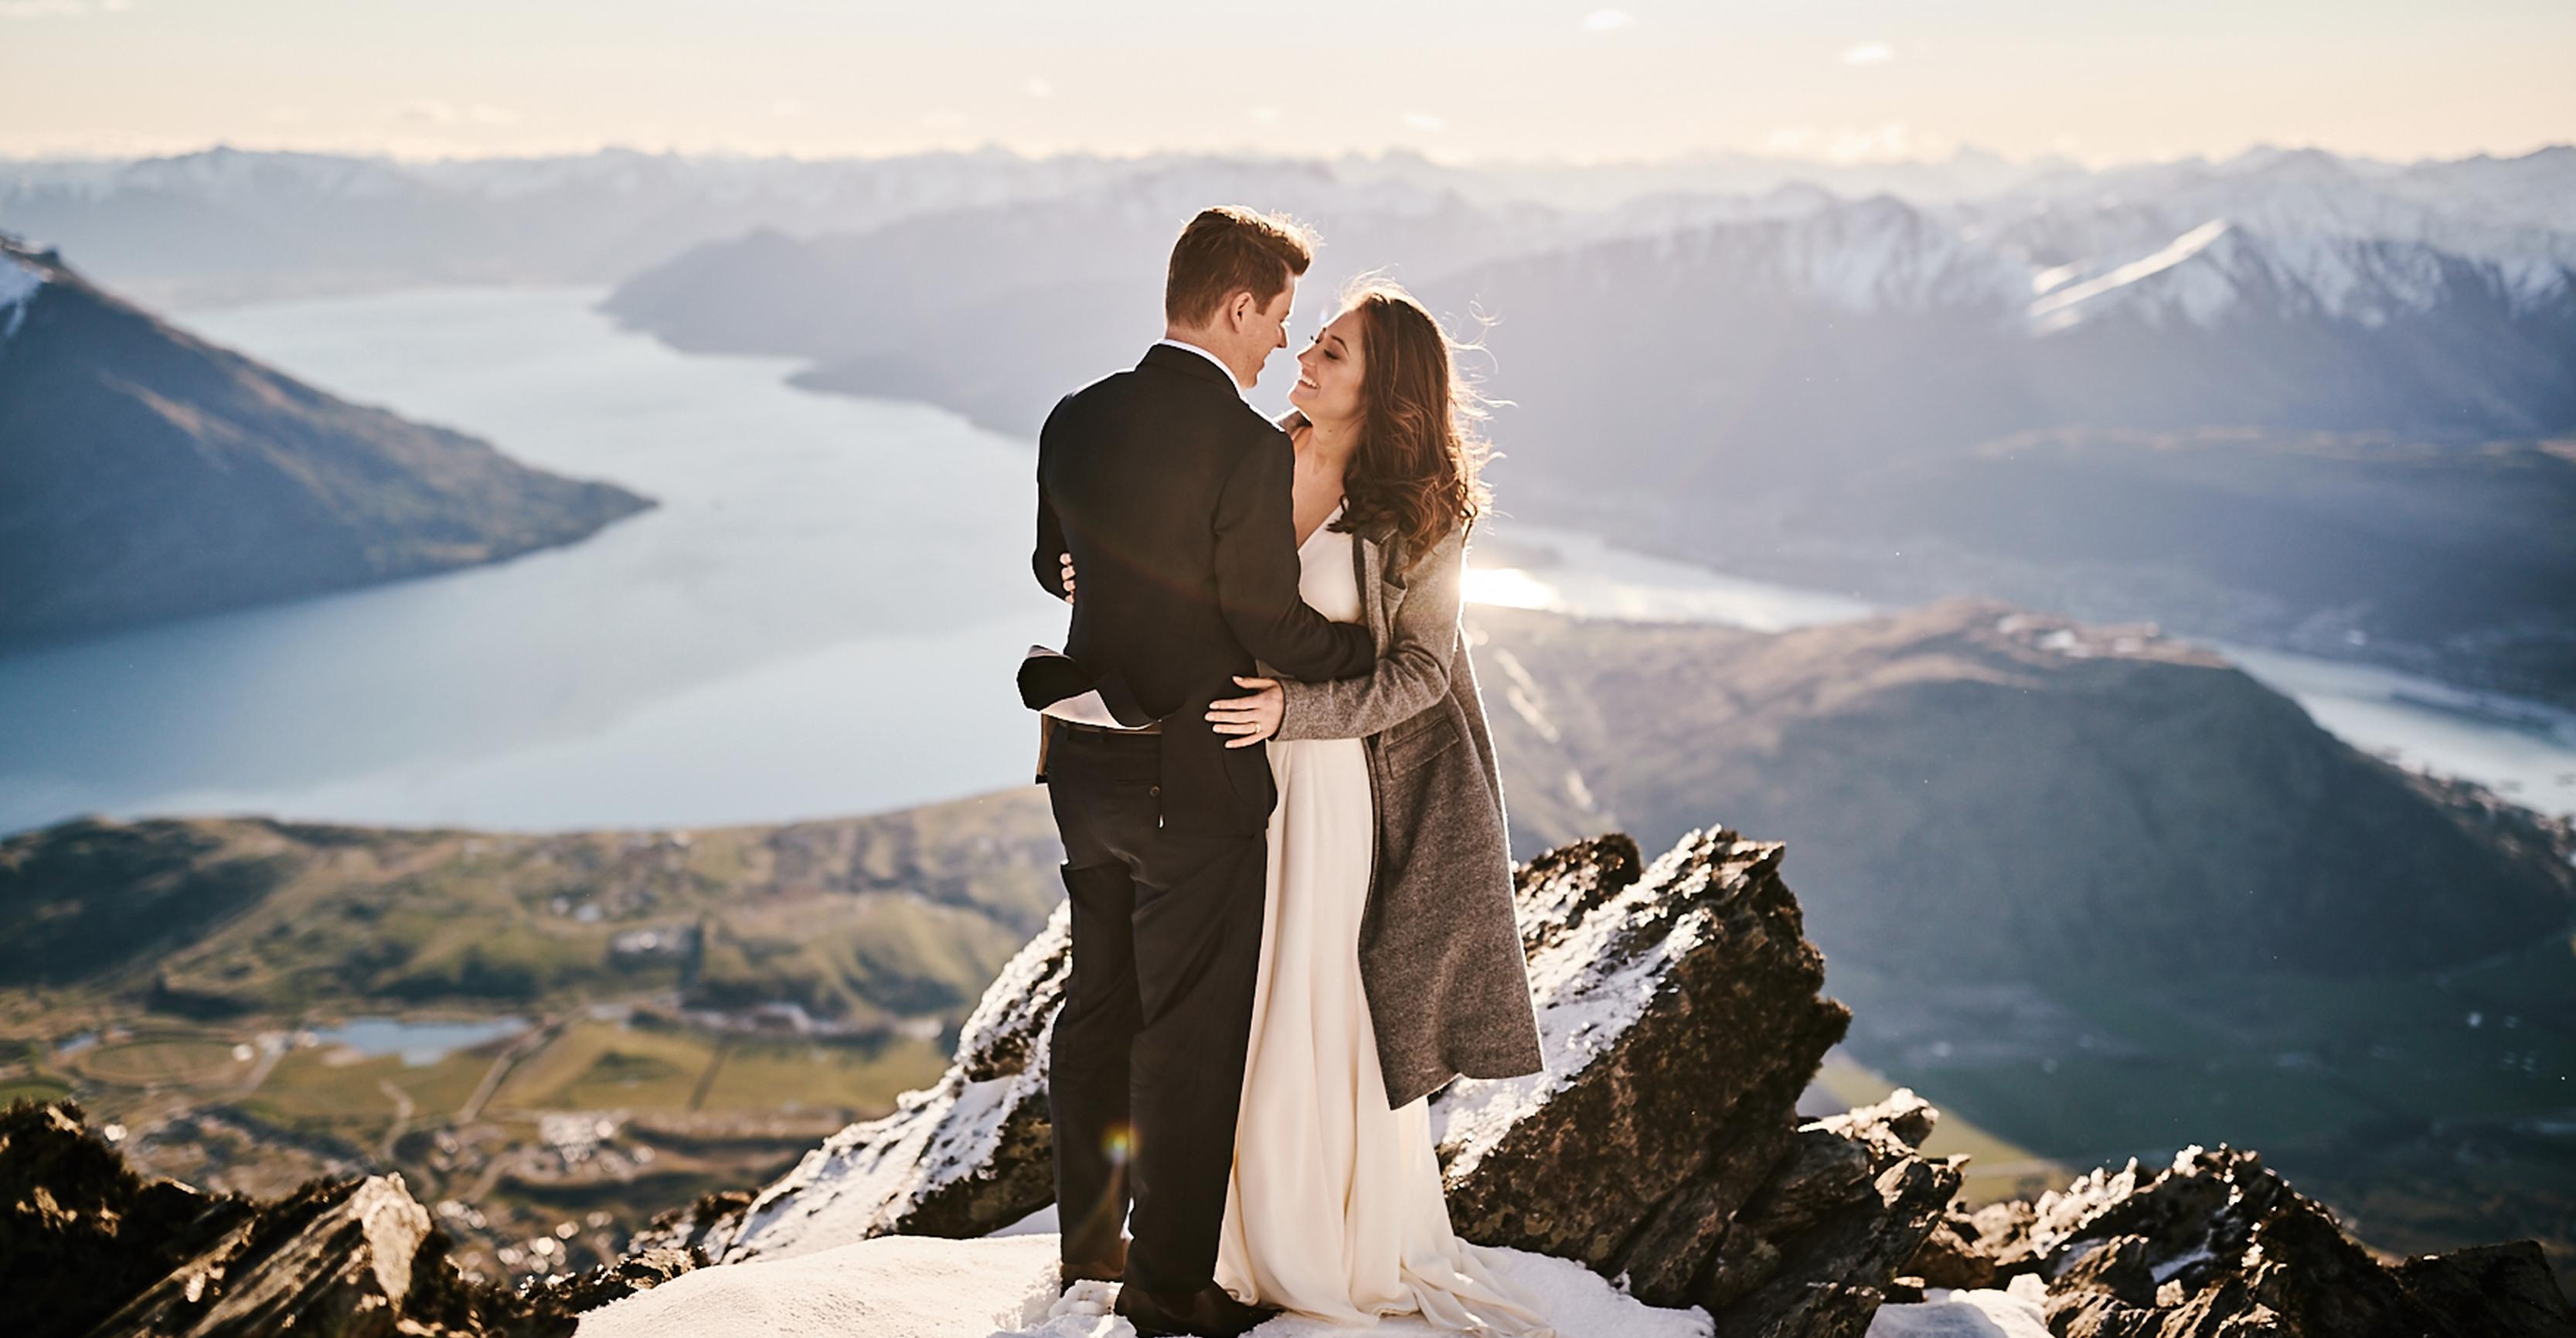 Keira  + Jared | Queenstown, New Zealand | The Hilton Queenstown